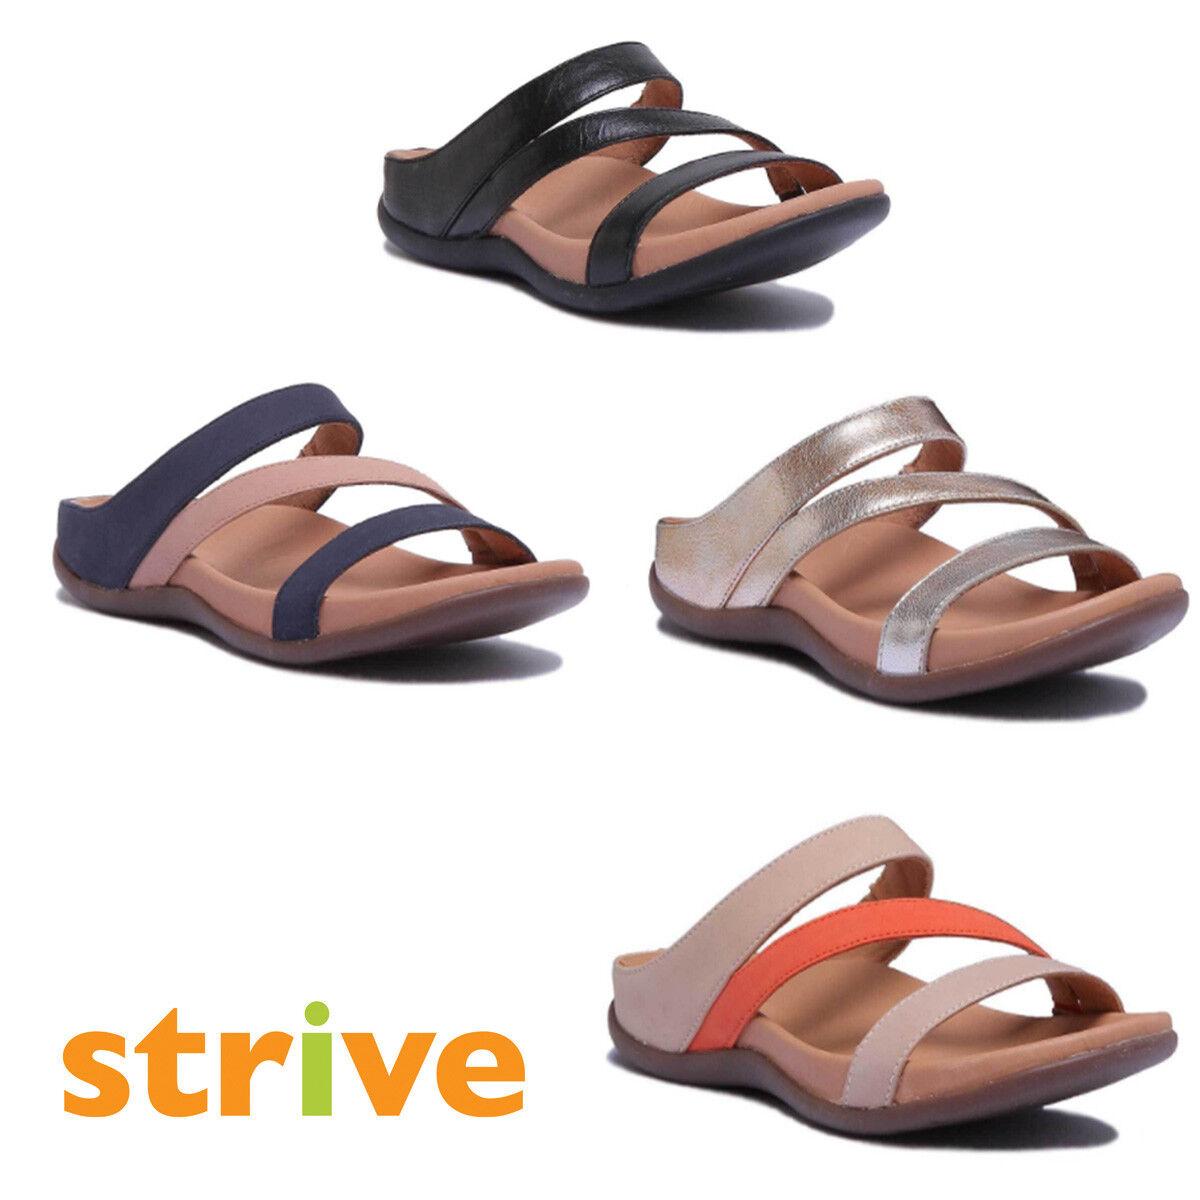 Strive Trio Women Nubuck Leather Oxford Tan Tiger Lily Strappy Sandals Size 3 -